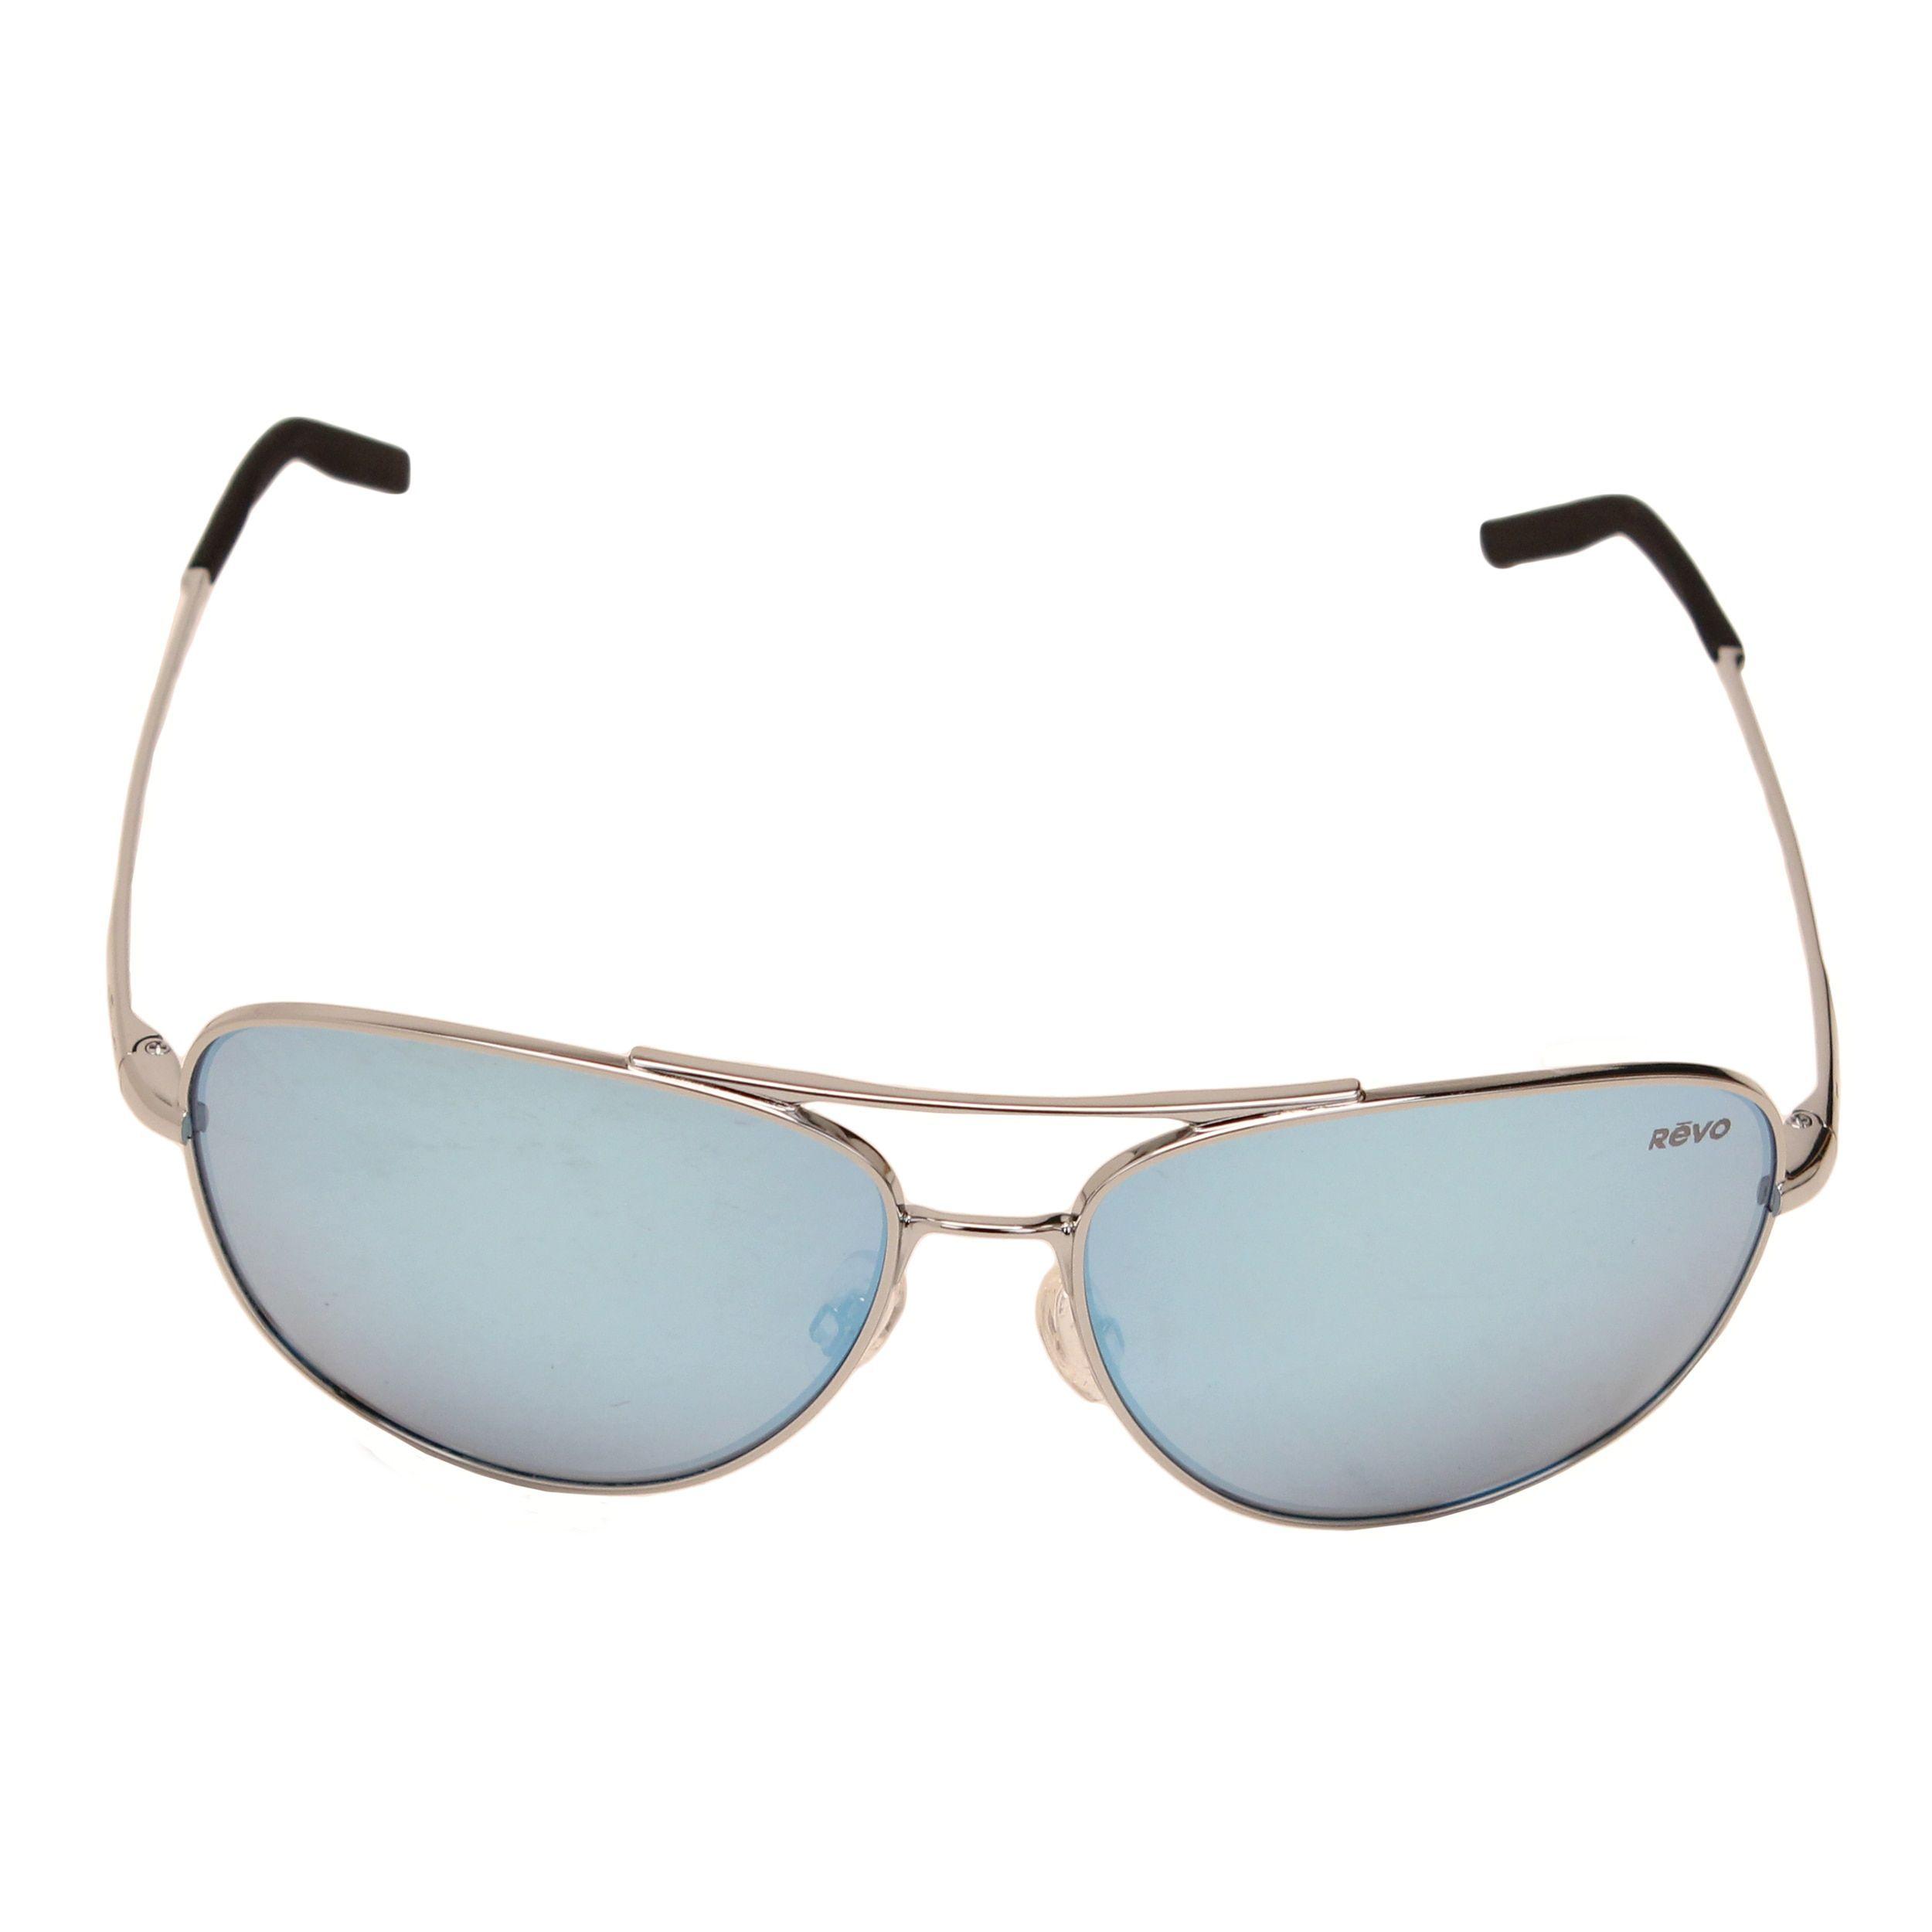 5db28b63d1a Revo Men s RE 3087 03 BL Windspeed Sunglasses With Chrome Frame and Blue  Water Serilium Lens